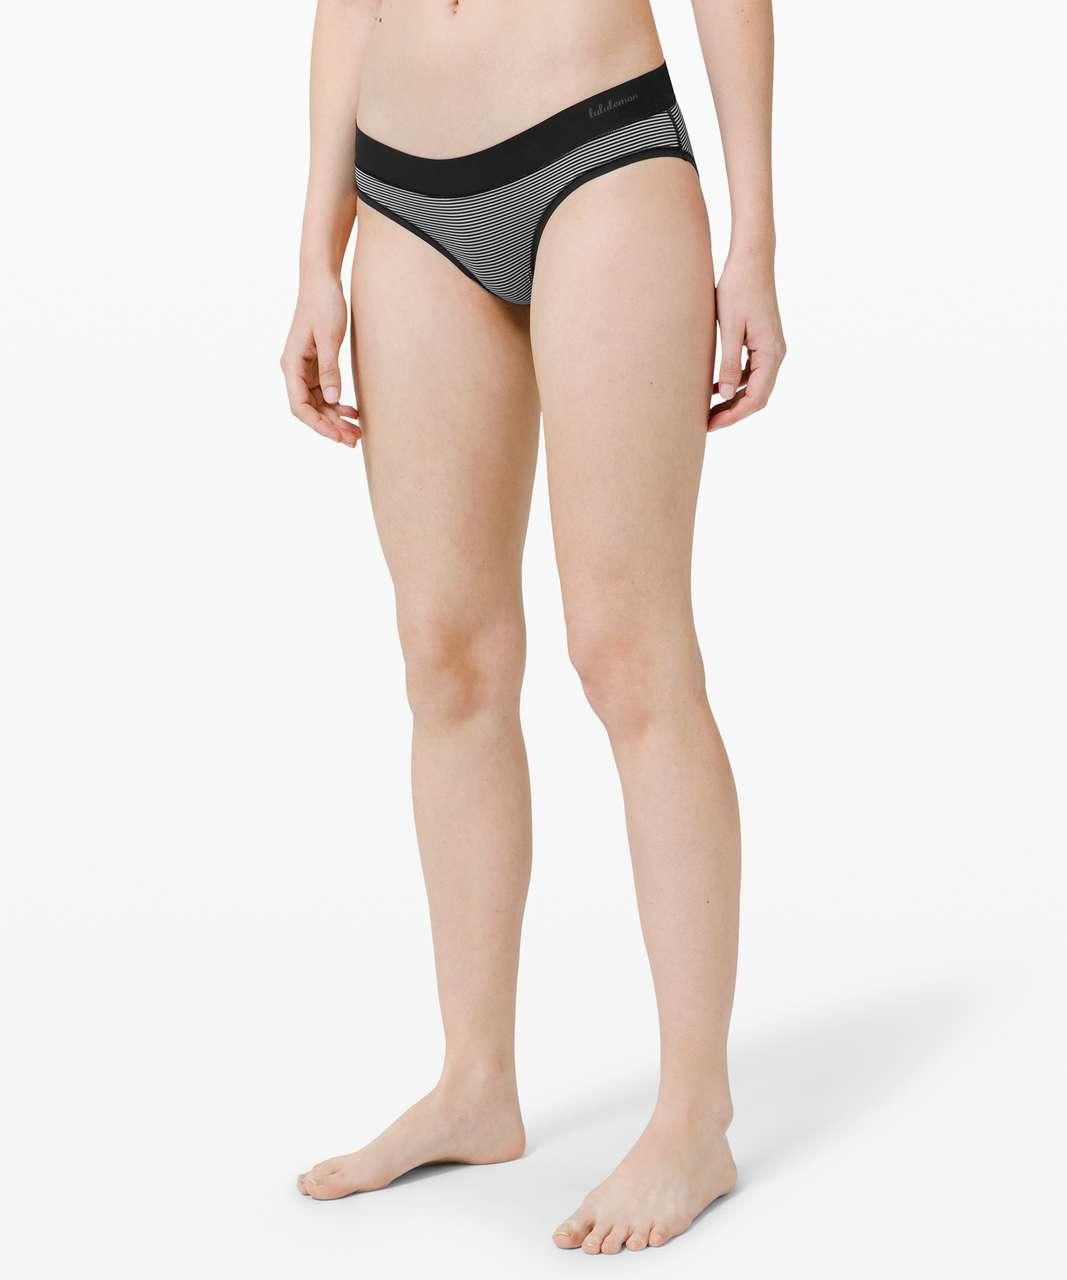 Lululemon Mula Bandhawear Bikini *3 Pack - Black / Misty Shell / Black